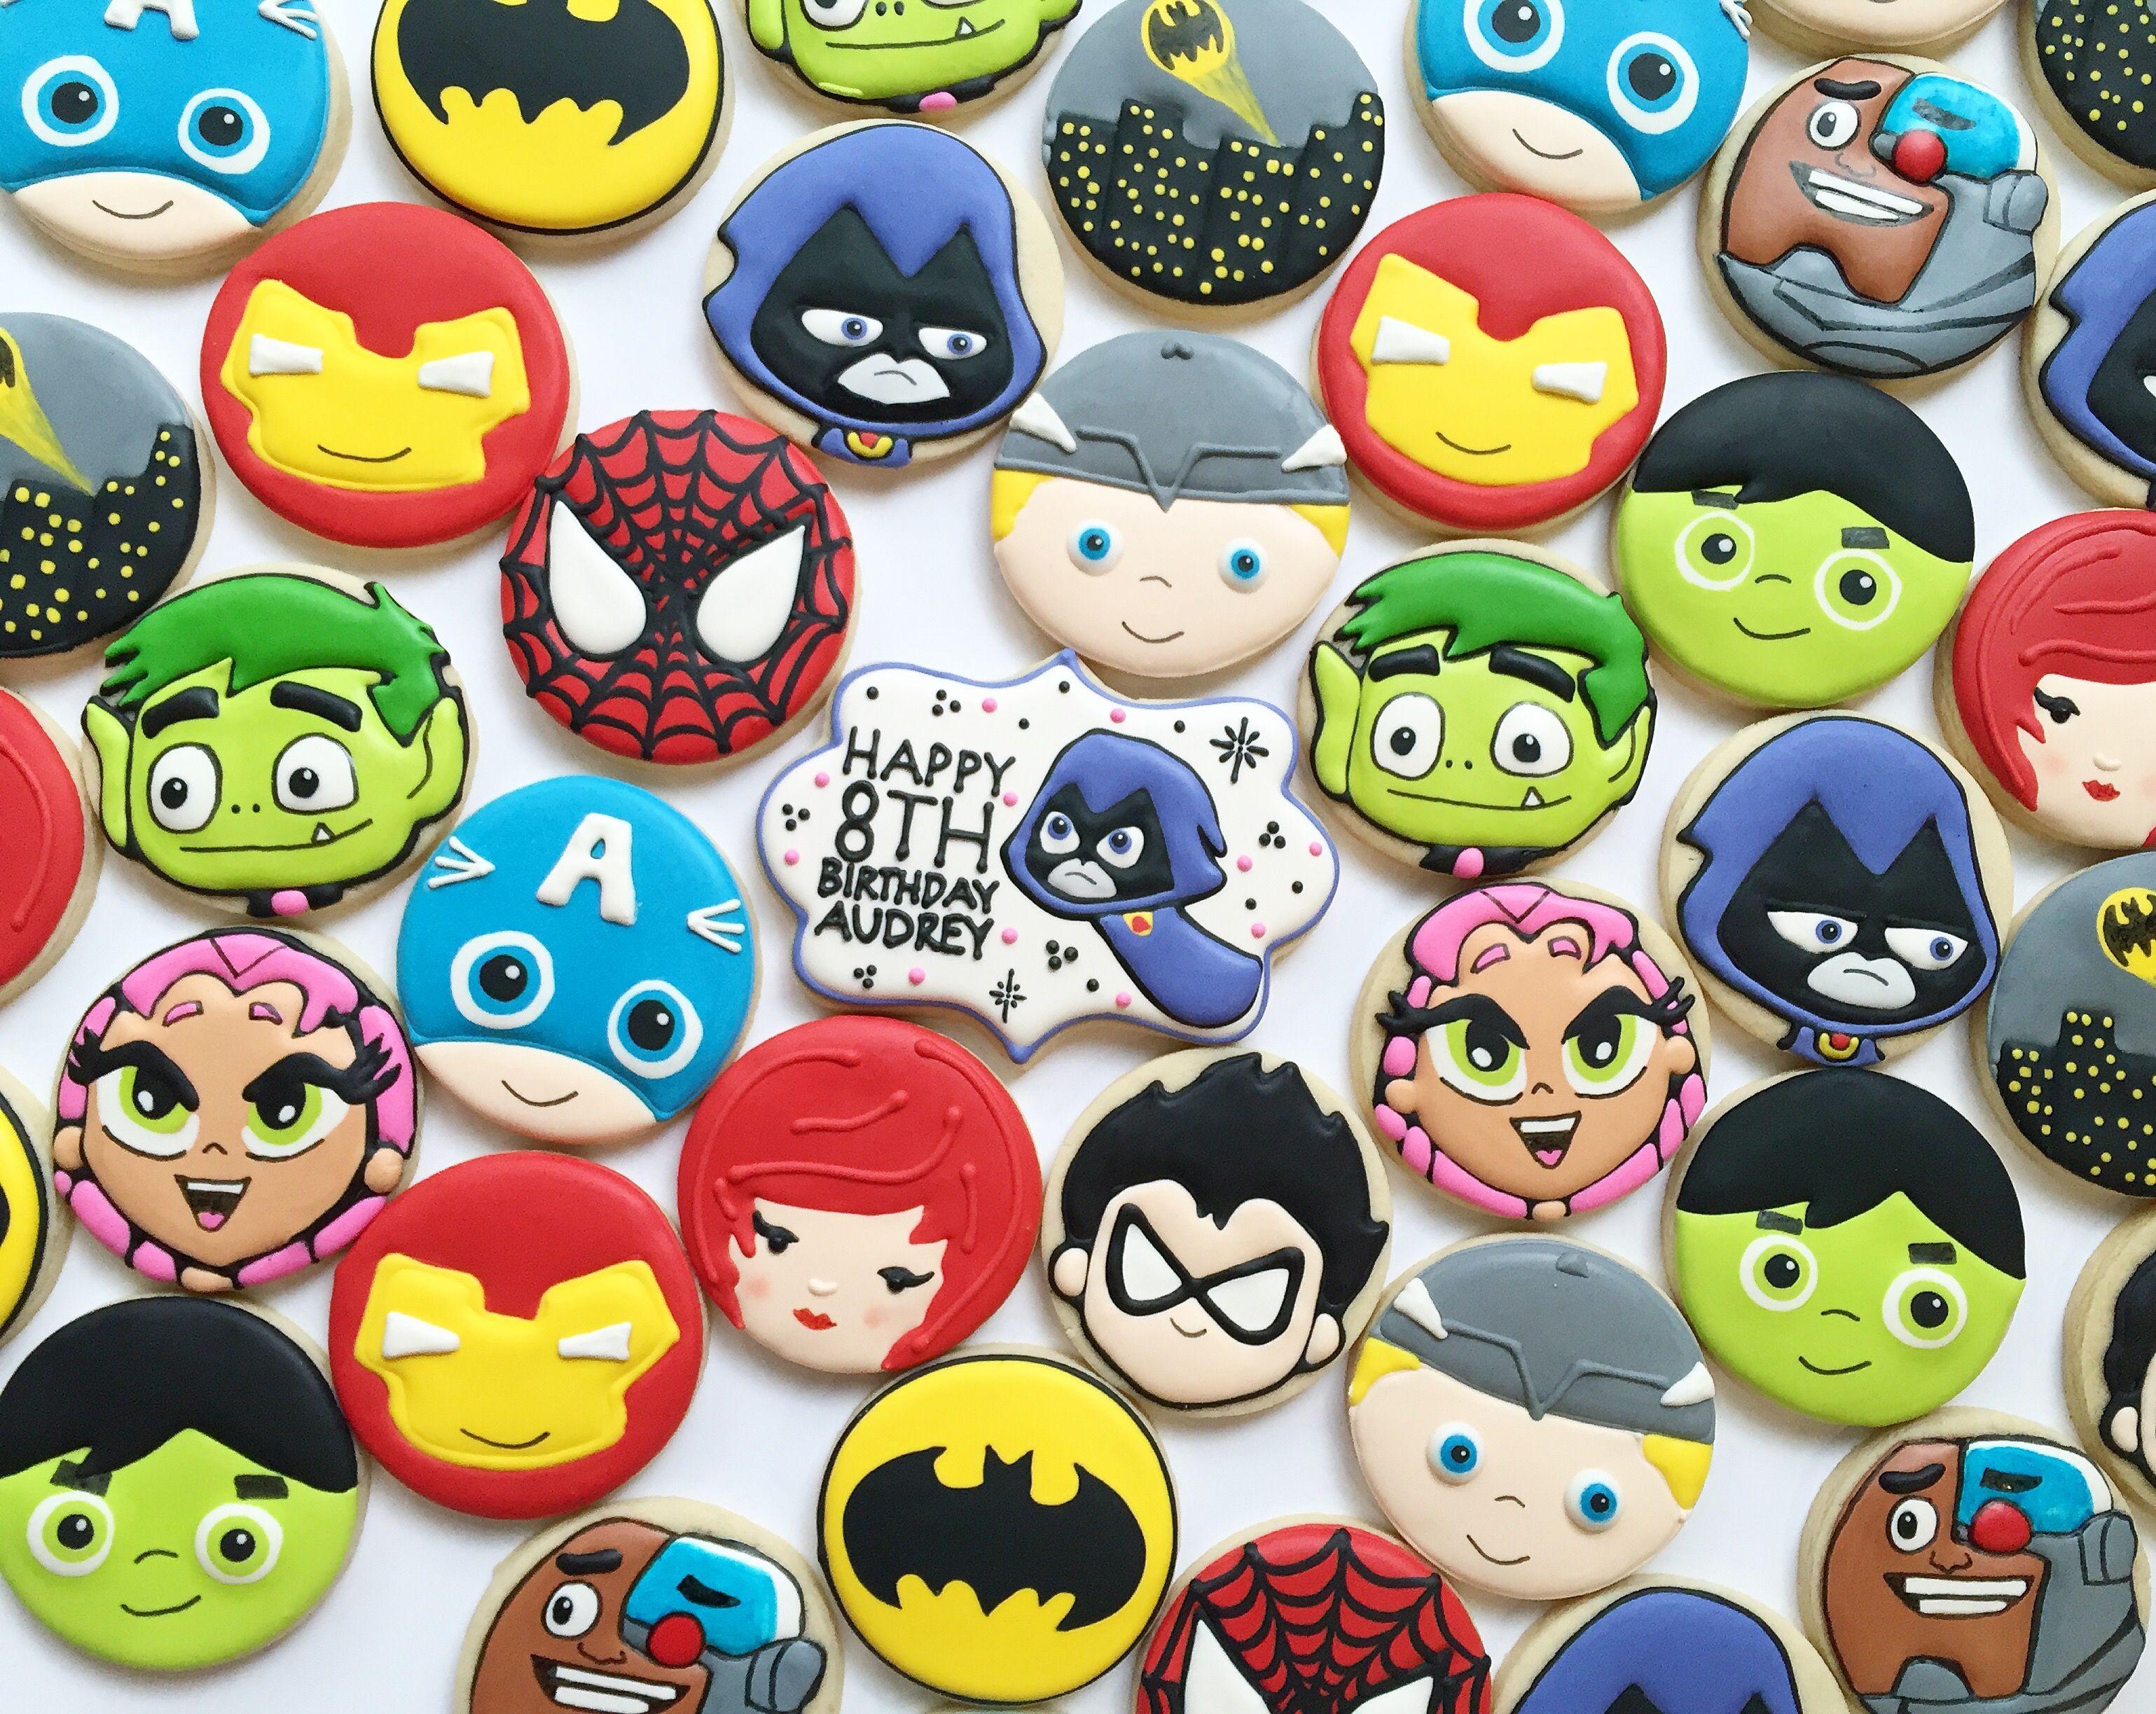 Superhero Sugar Cookies - Teen Titans - Avengers - Spiderman and Batman Cookies by Holli